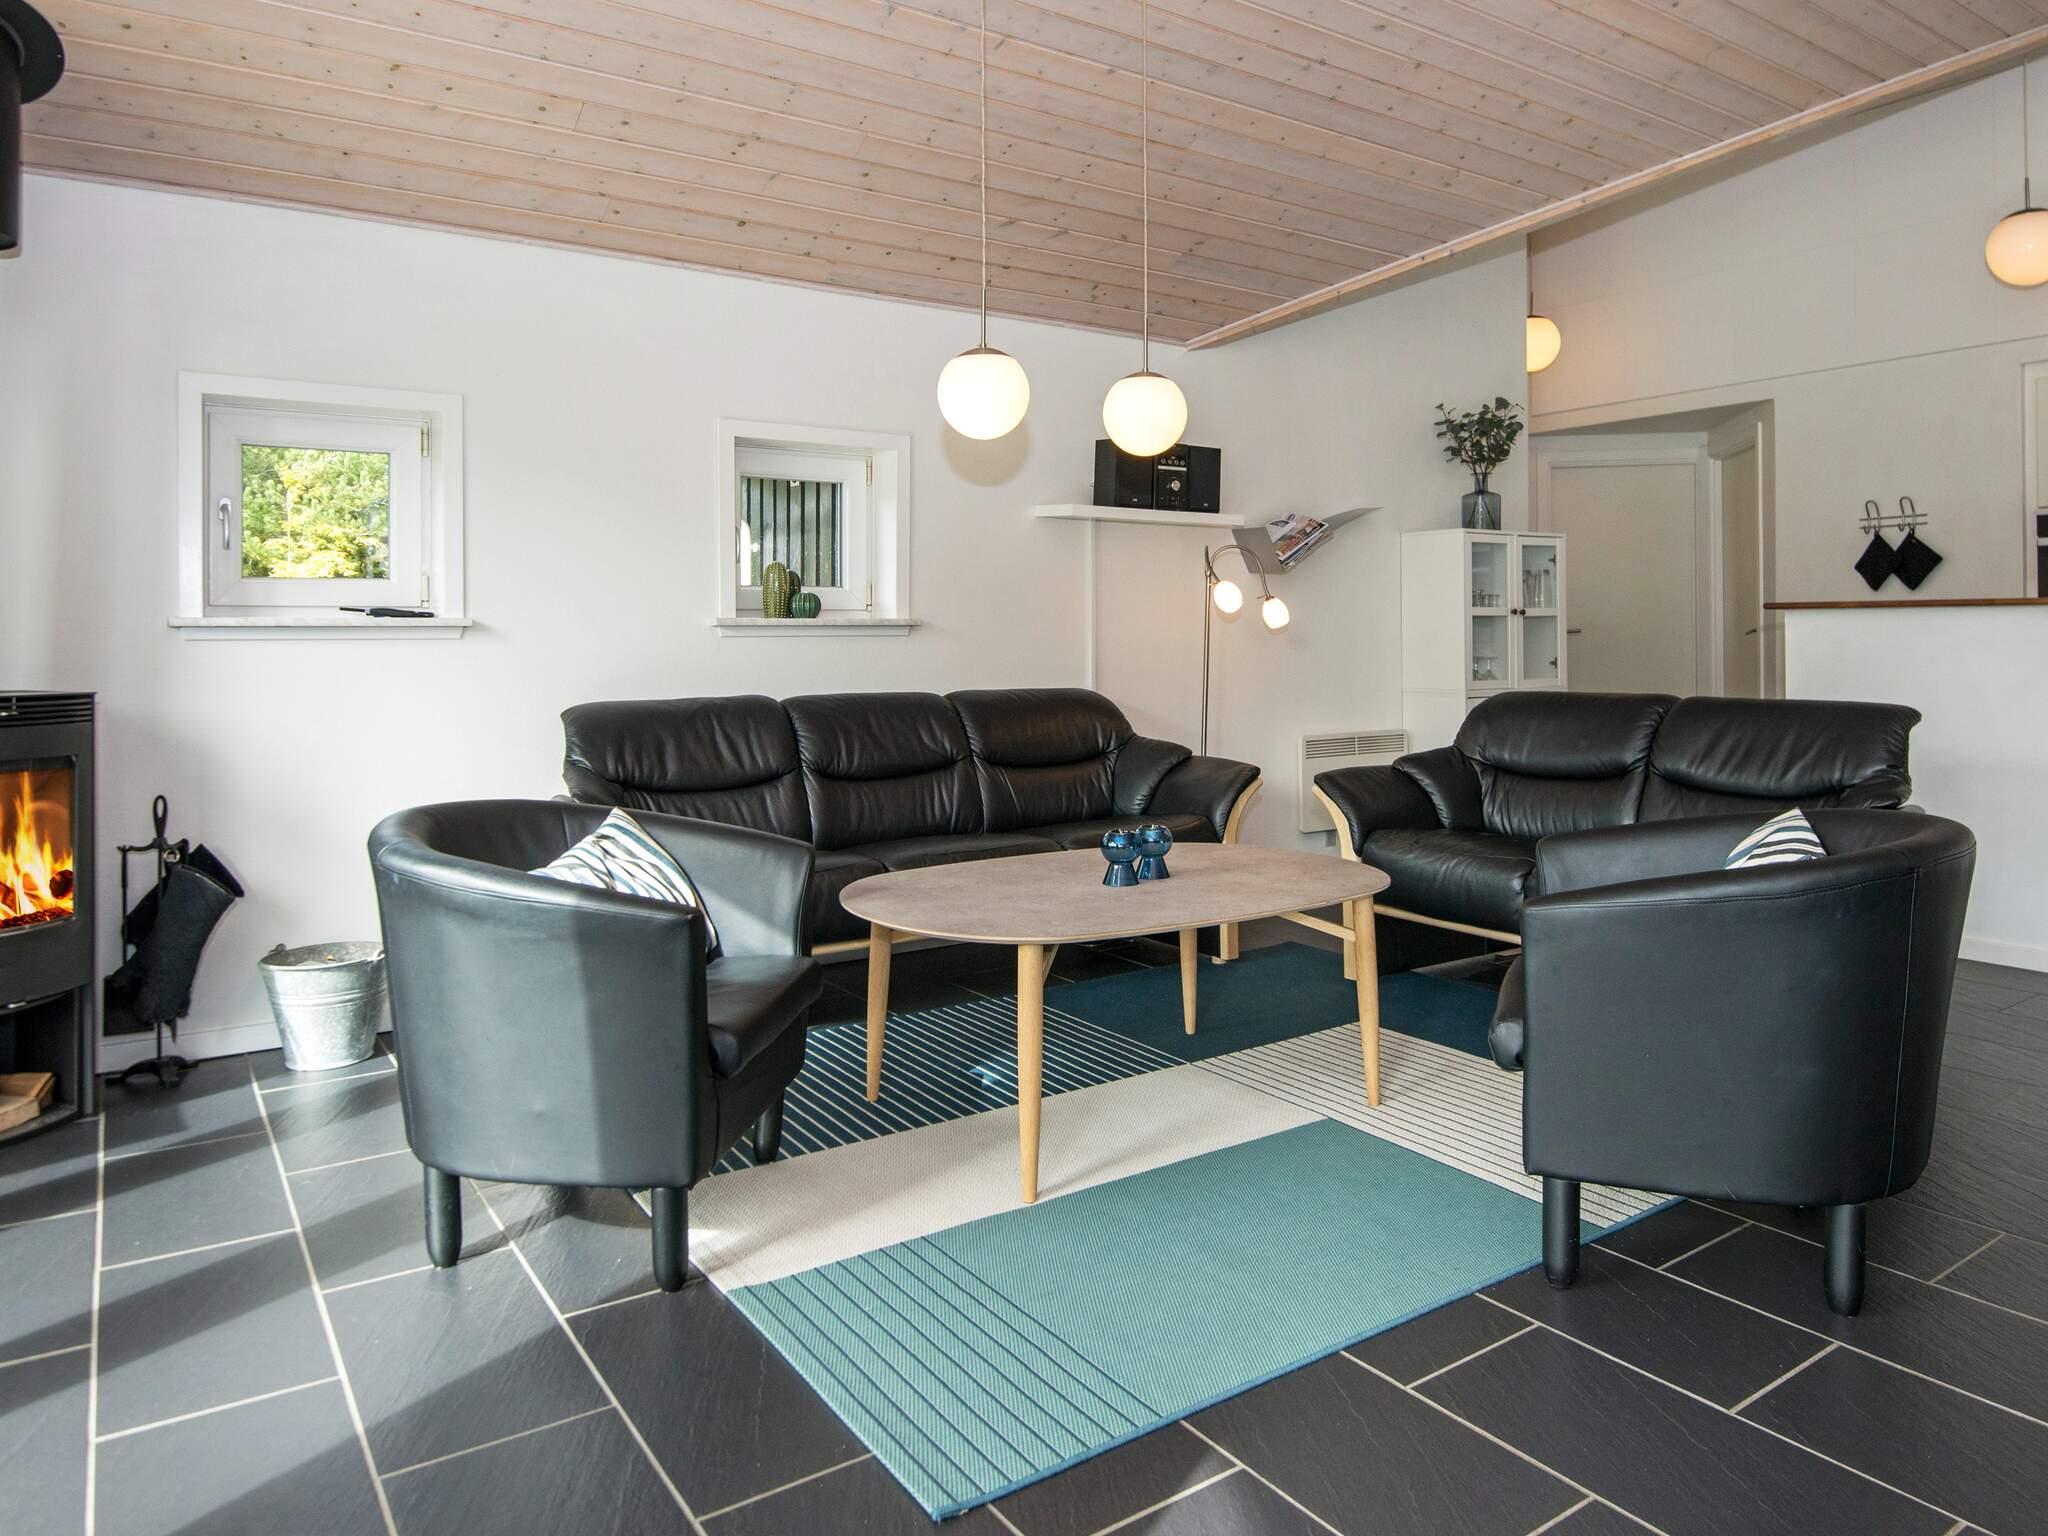 Ferienhaus Skaven Strand (336578), Tarm, , Westjütland, Dänemark, Bild 8